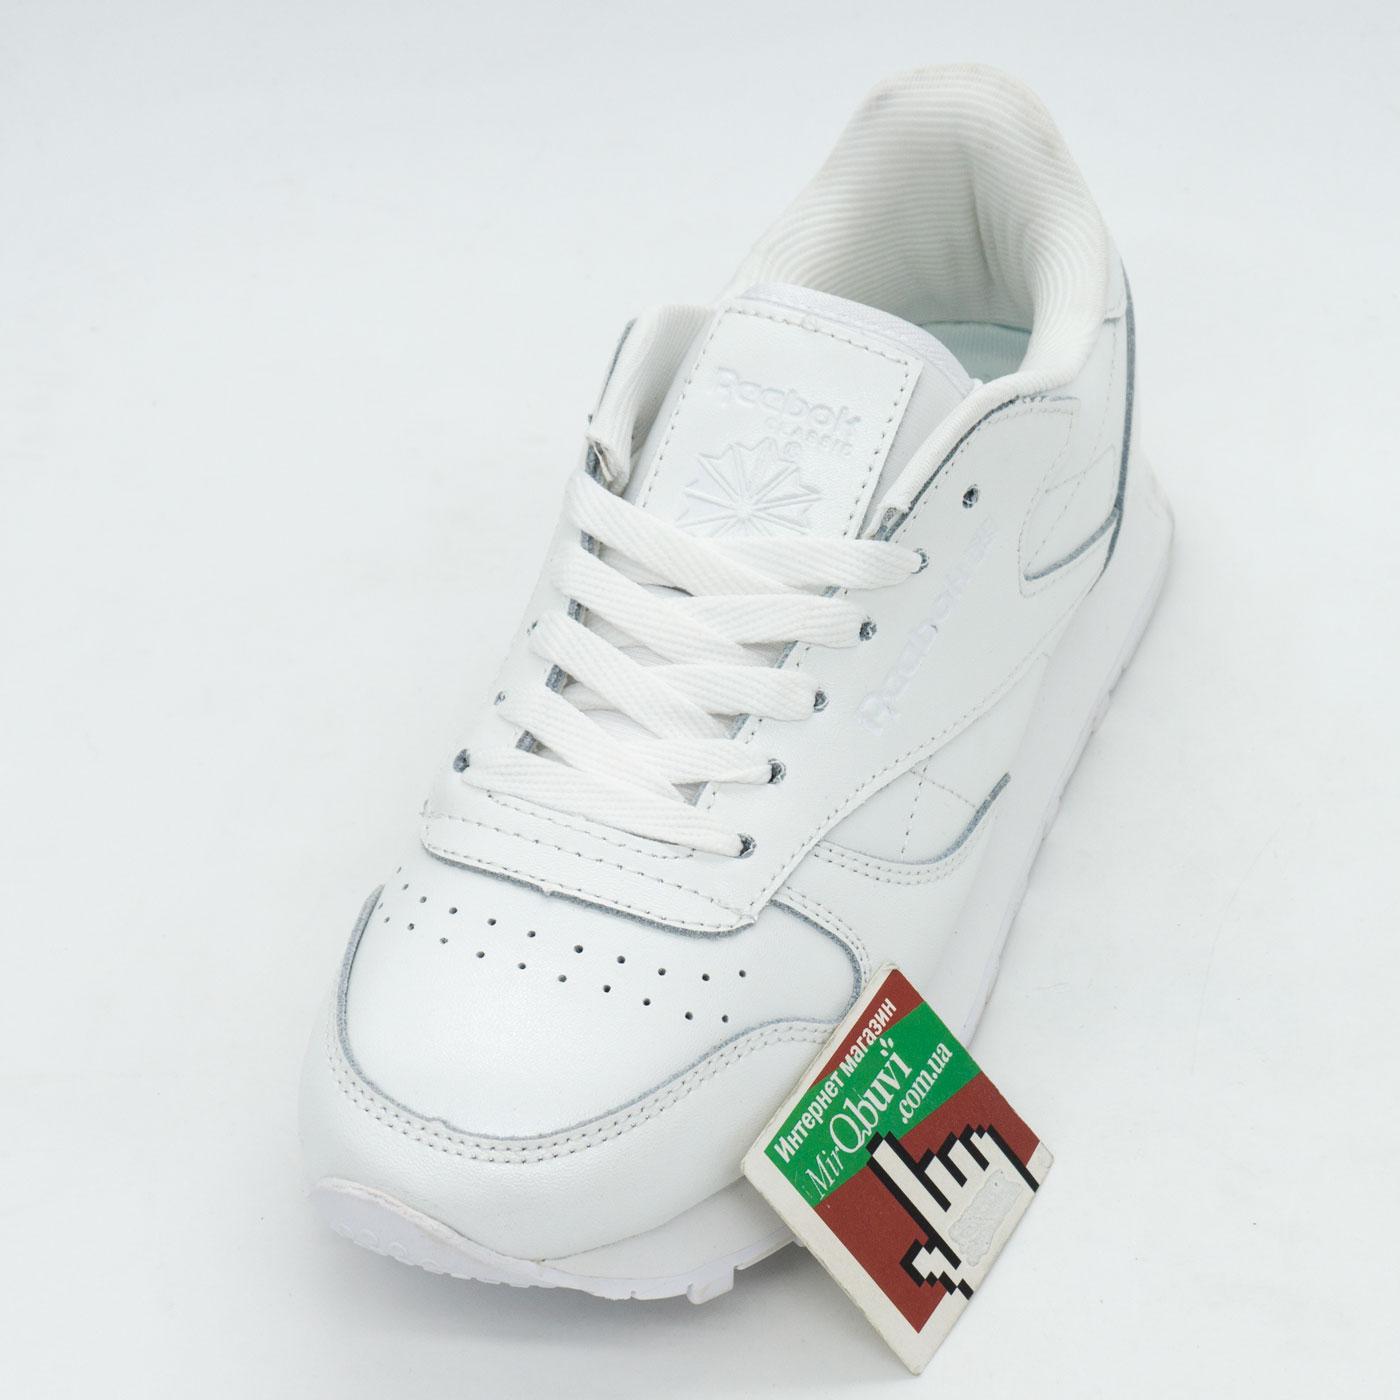 фото front Женские кроссовки Reebok classic leather white (Рибок класик белые, кожа) front